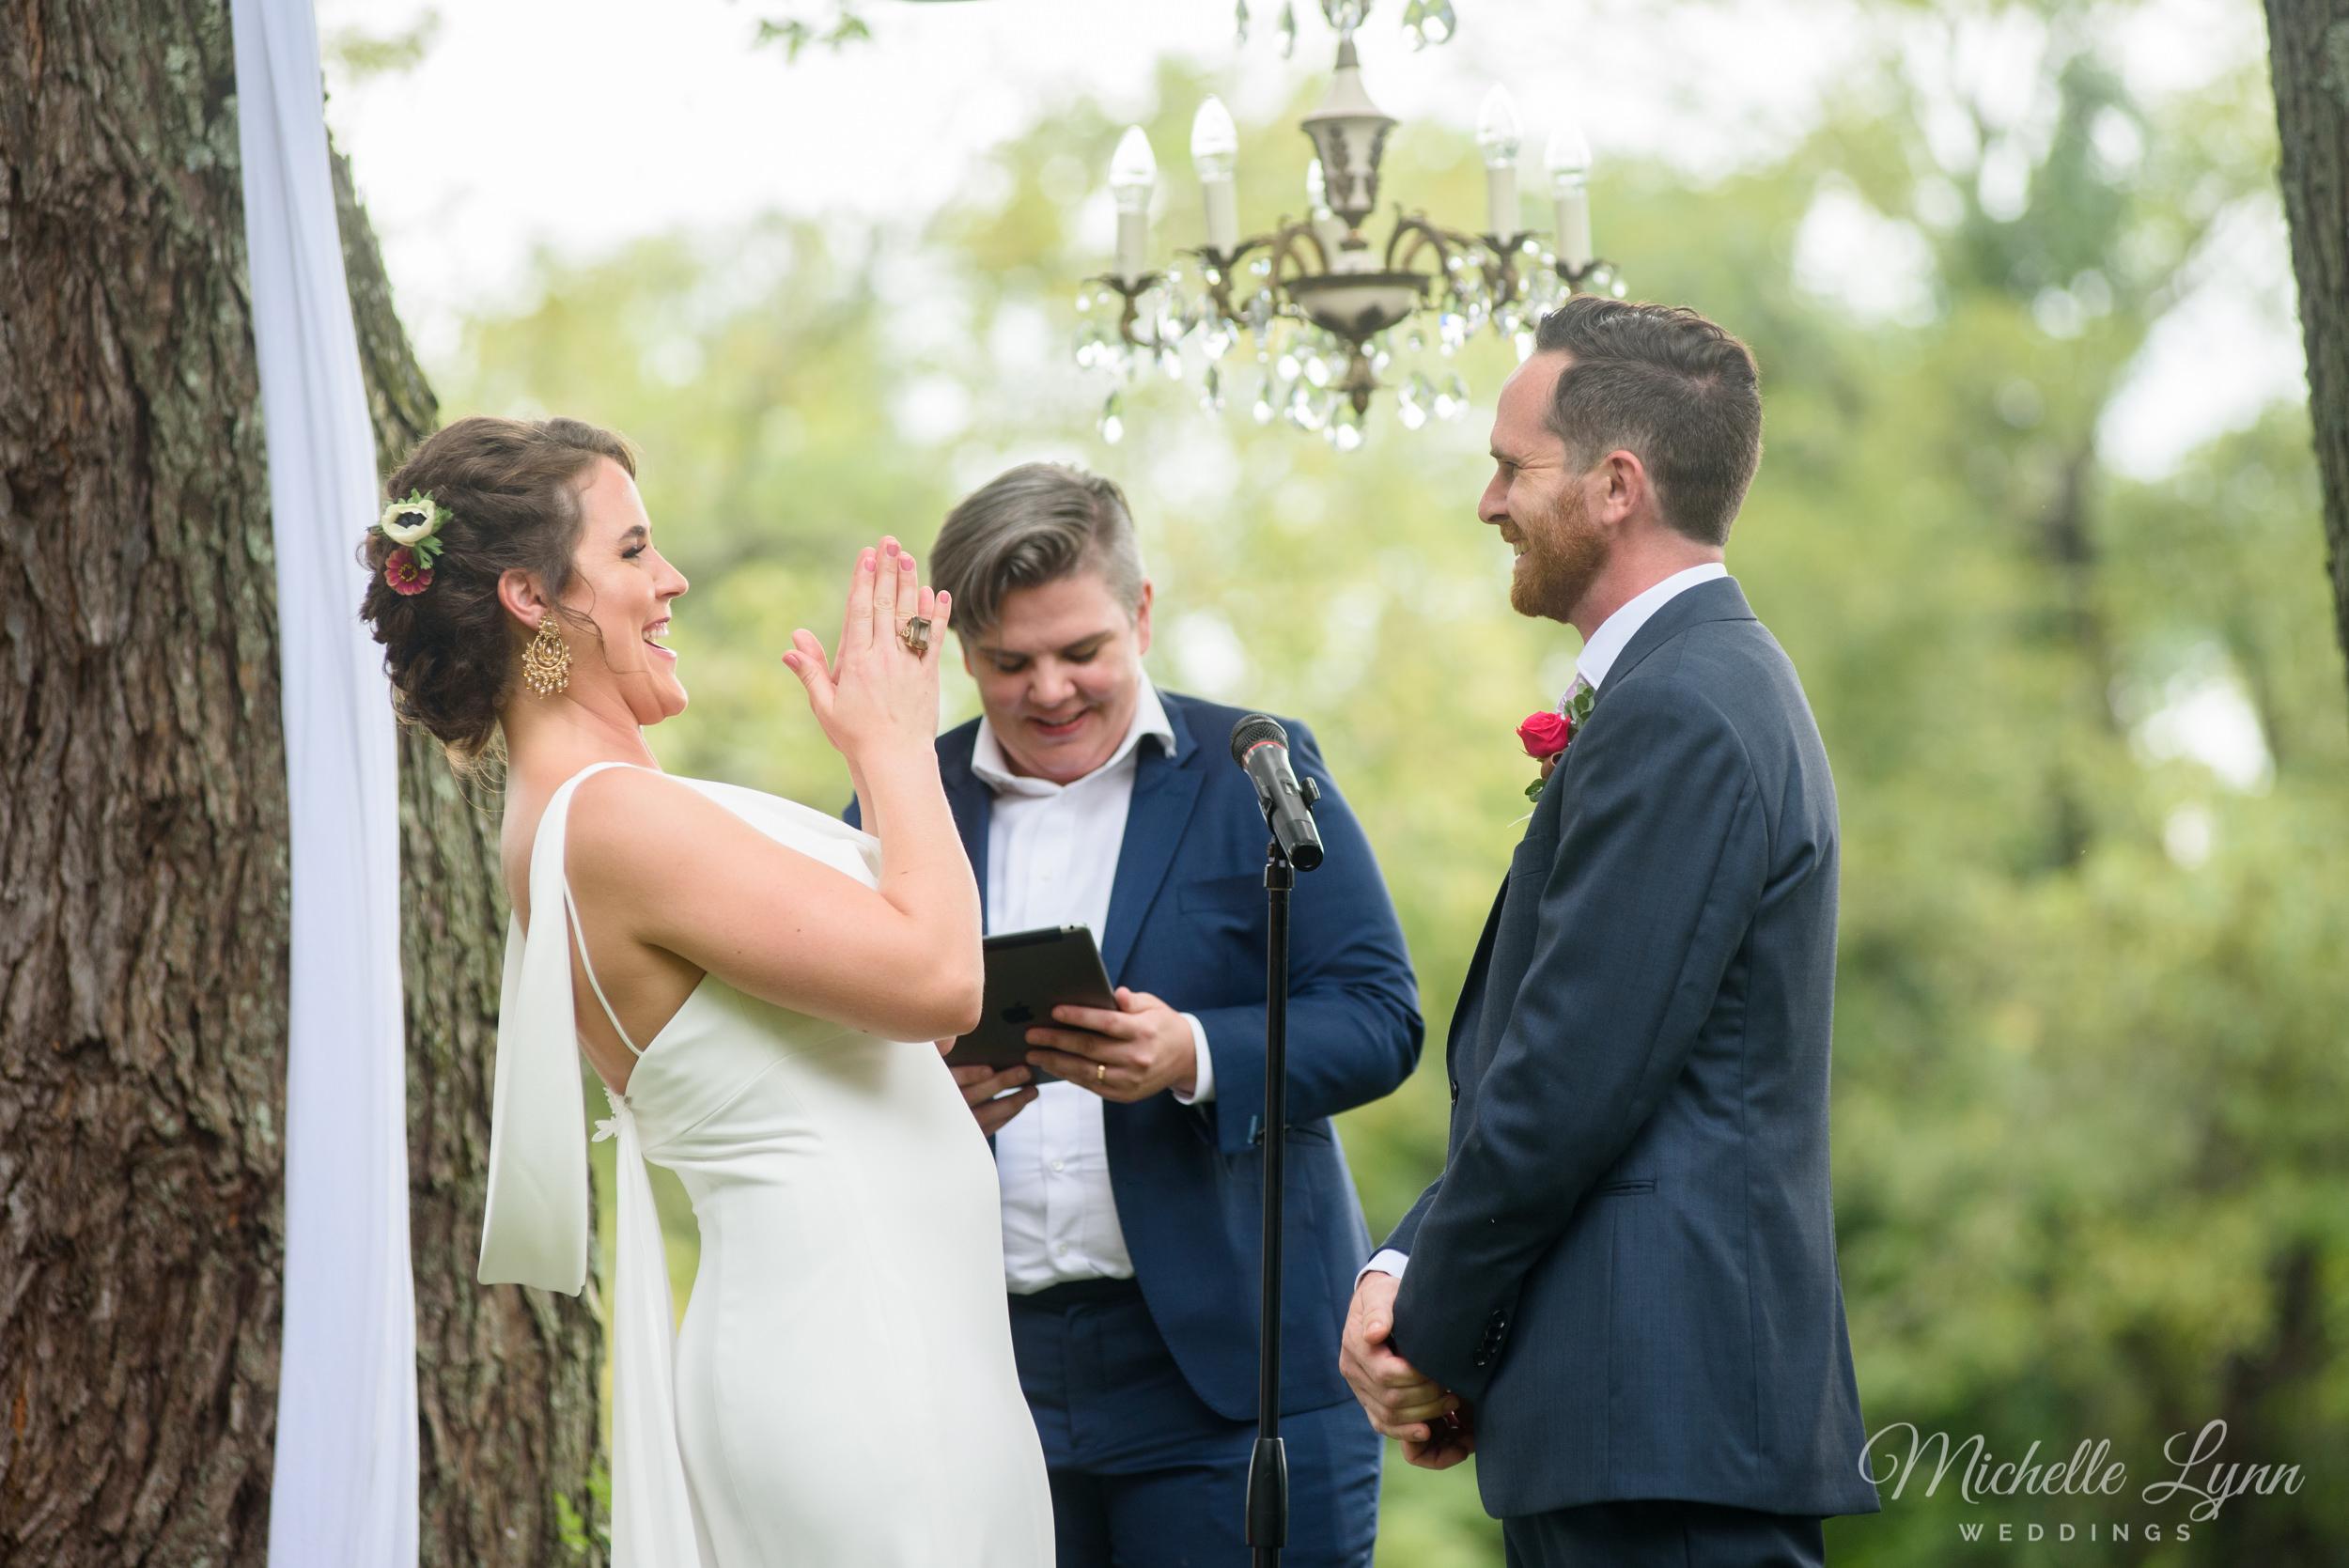 mlw-unionville-vineyards-nj-wedding-photography-44.jpg